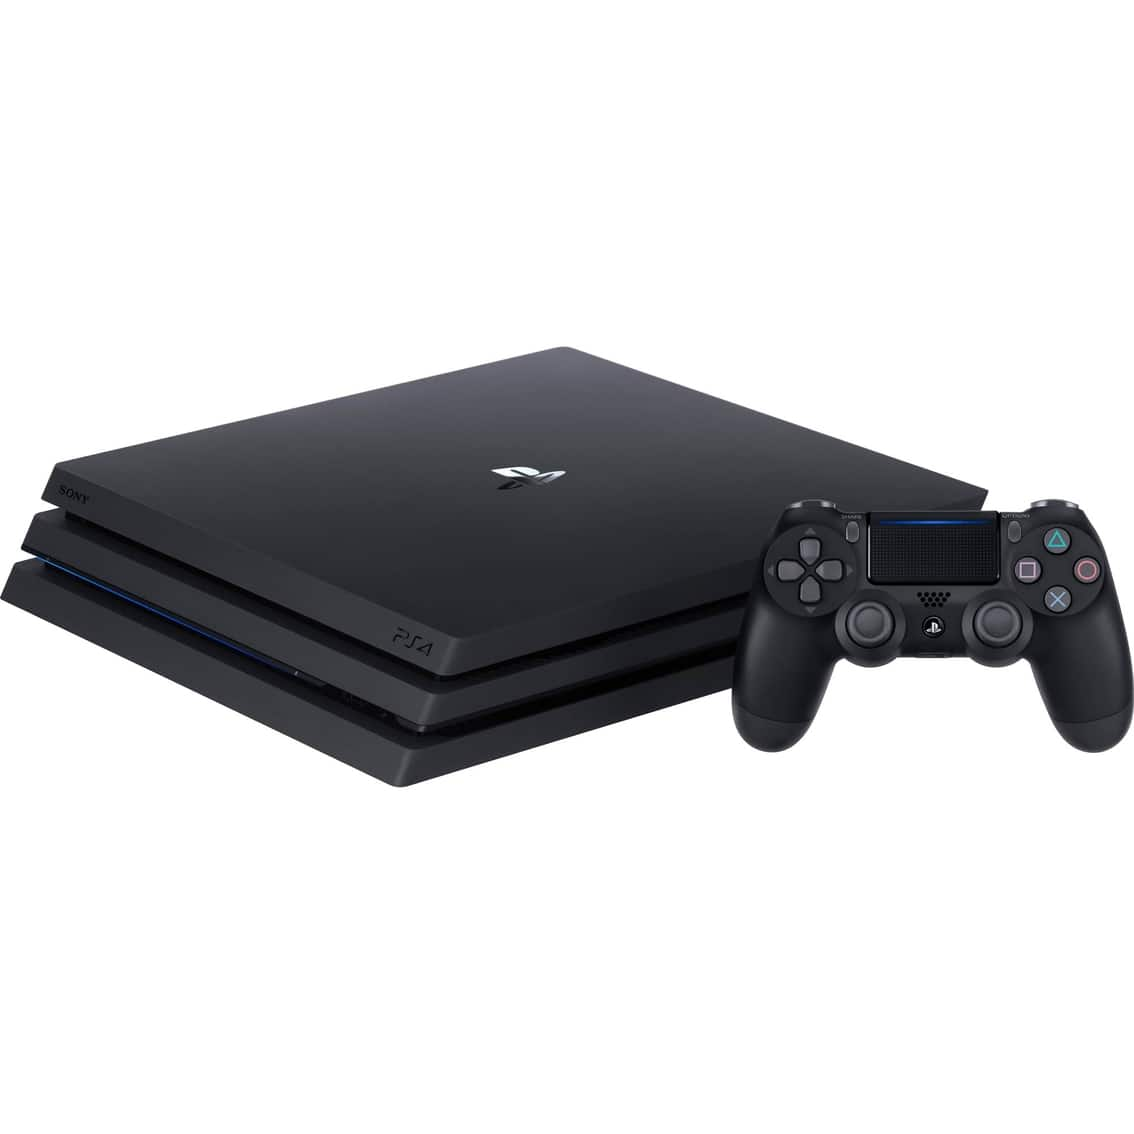 Playstation 4 pro for $349 at shopmyexchange.com